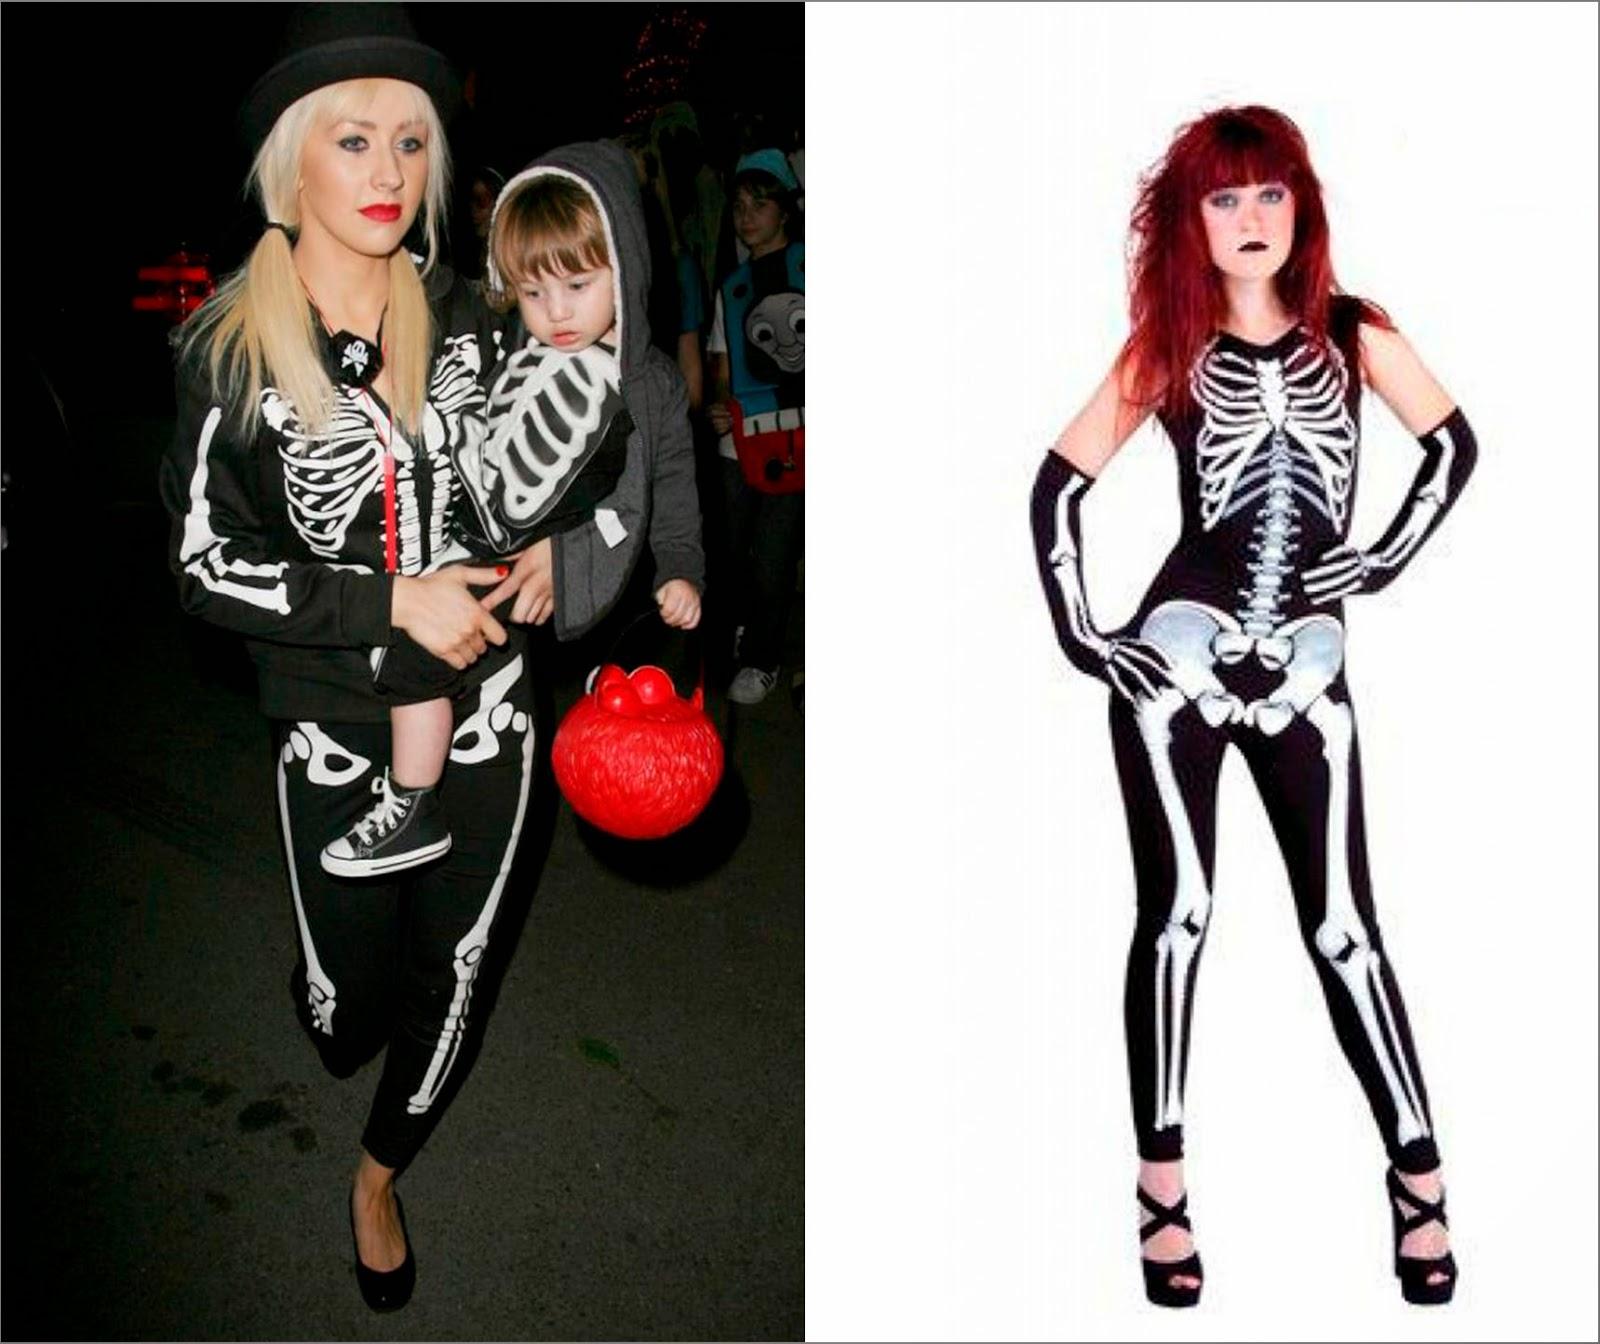 Trendy in the Sky: Disfraces Halloween famosos y,